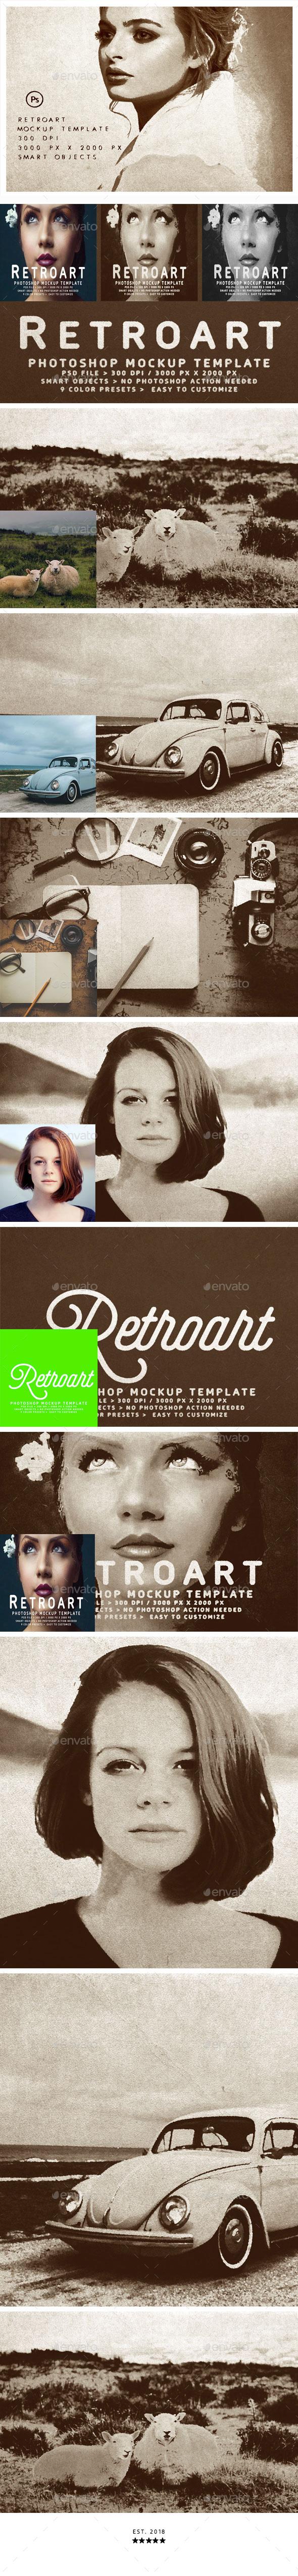 Retroart Mockup Template - Photo Templates Graphics